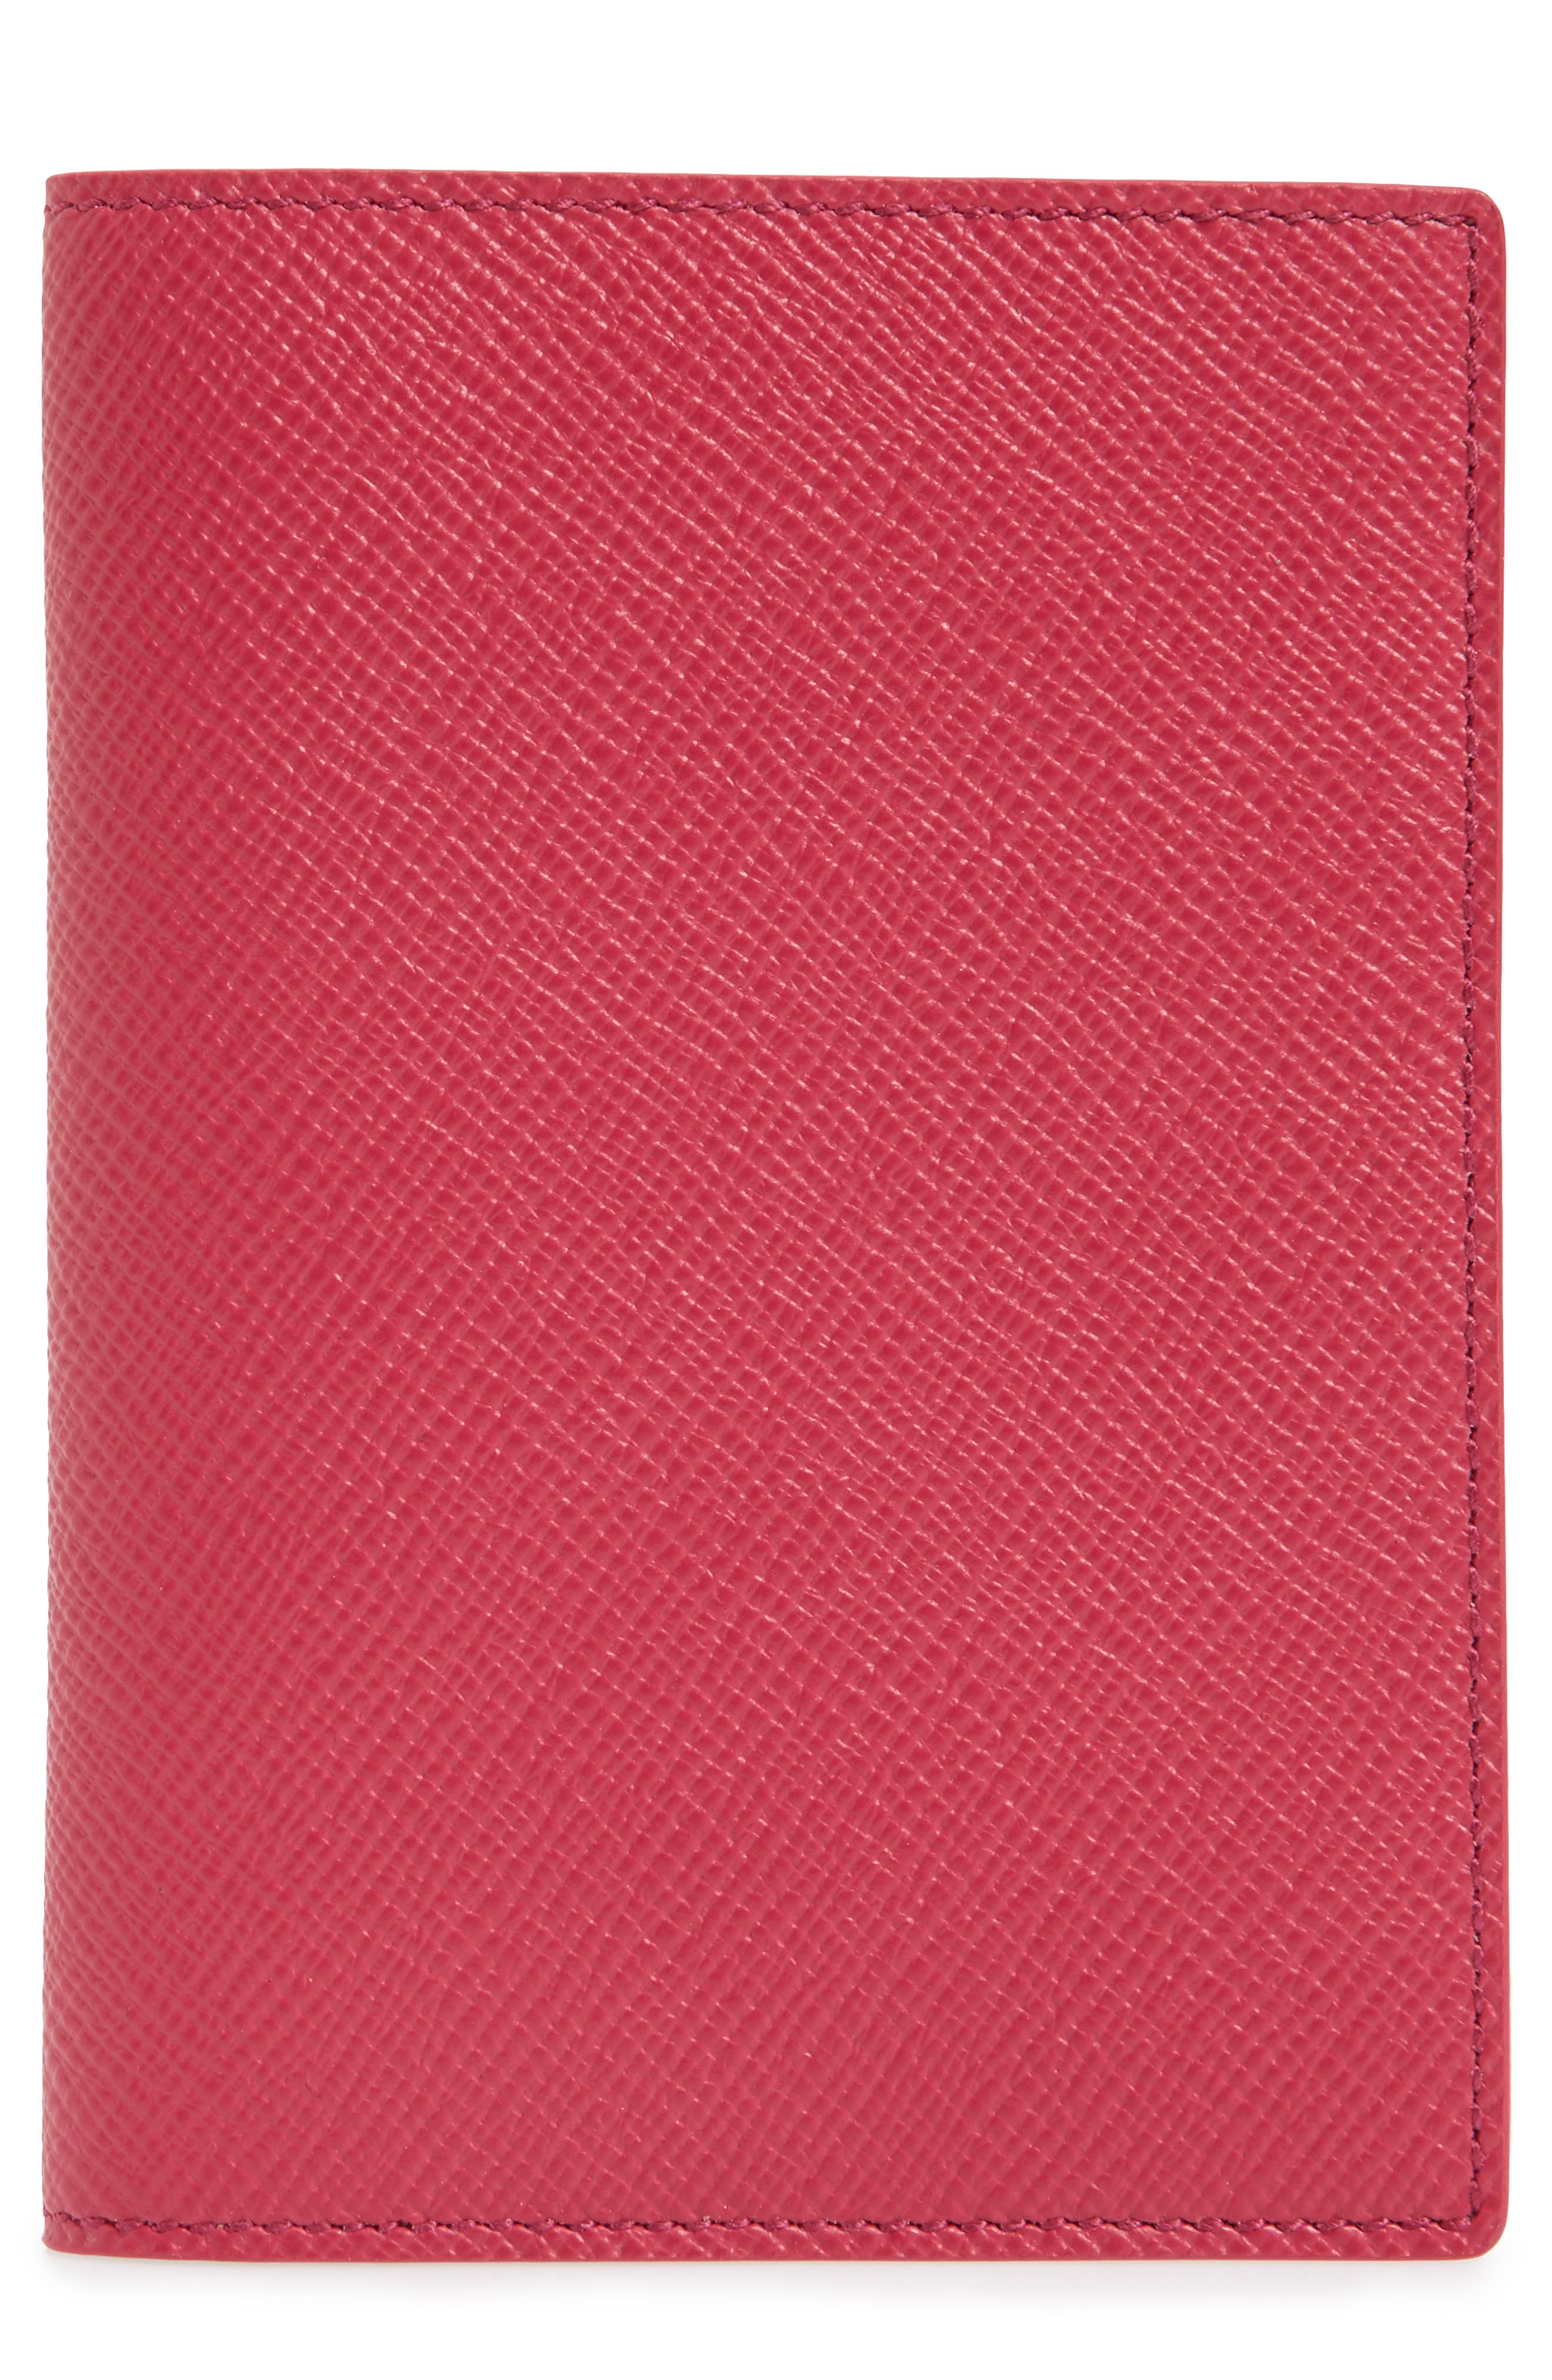 Panama Calfskin Leather Passport Holder,                             Main thumbnail 1, color,                             650